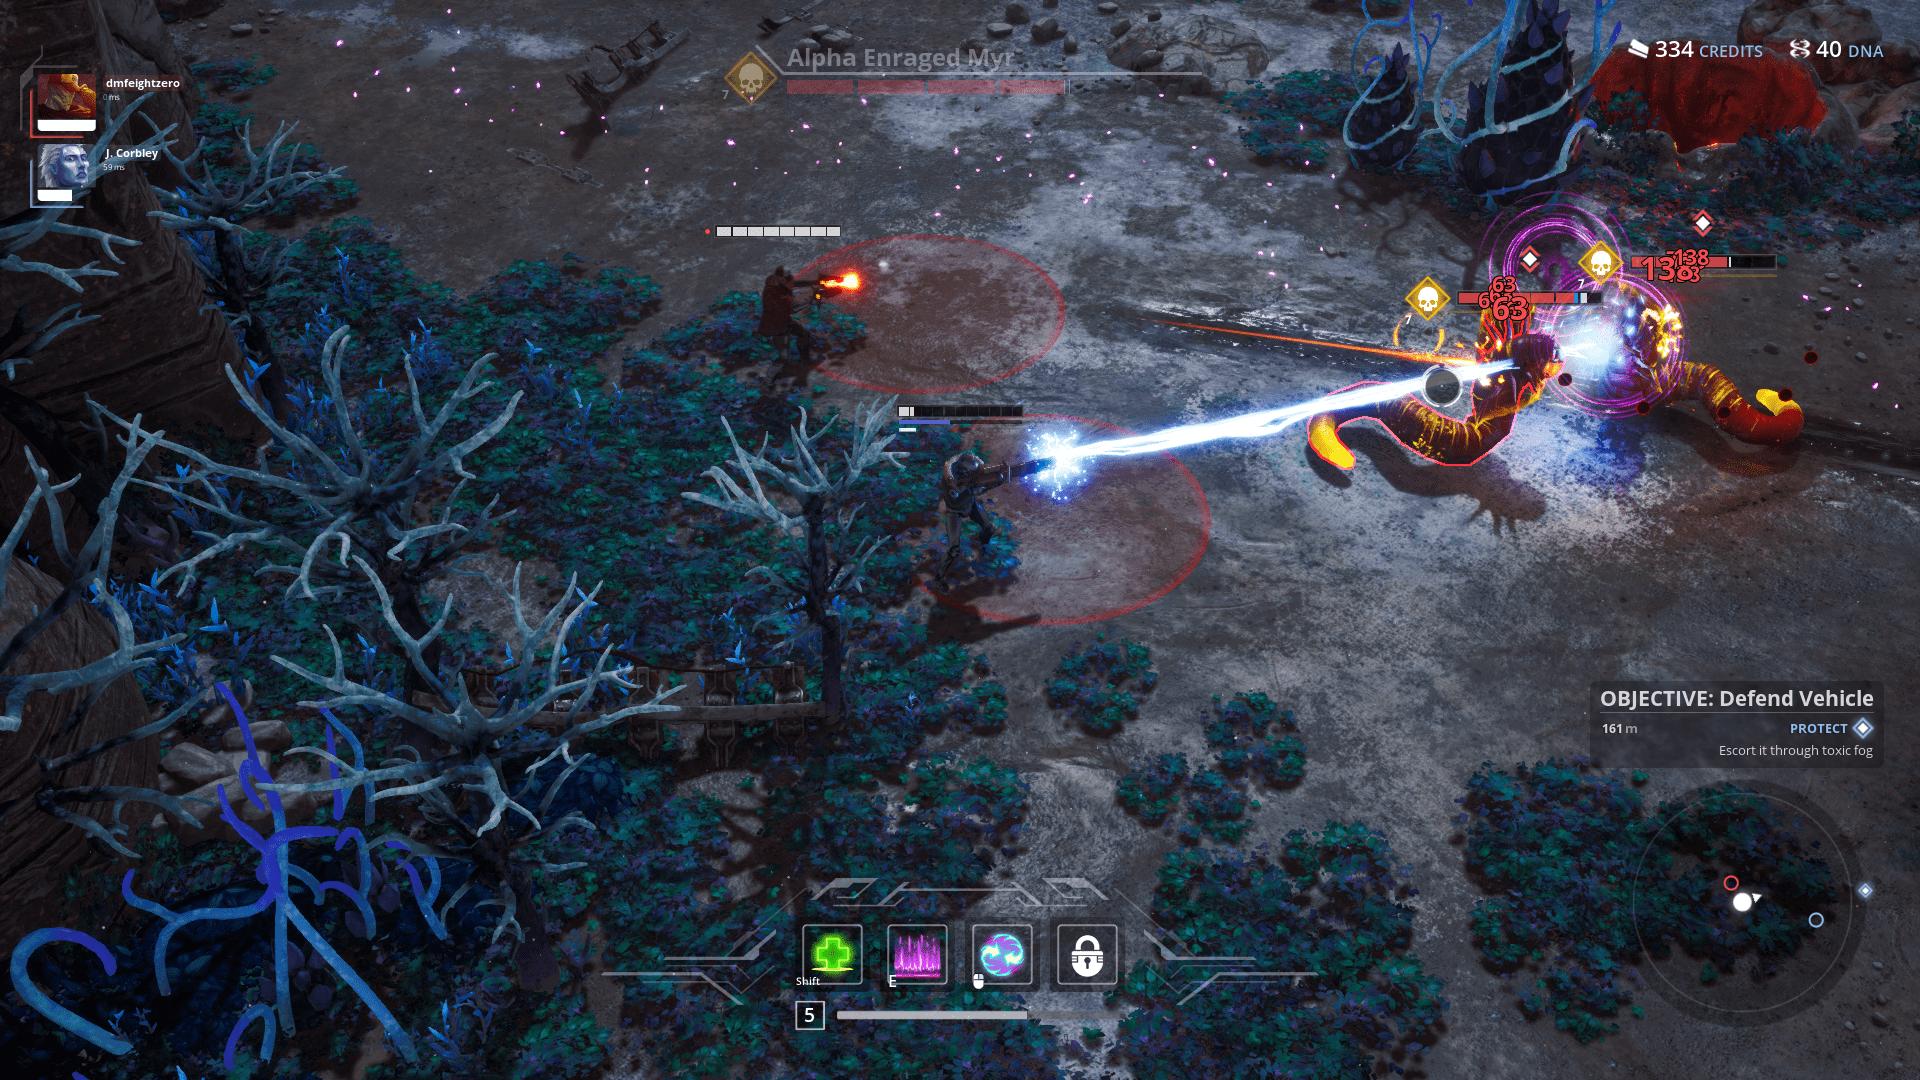 Killsquad game screenshot, fighting